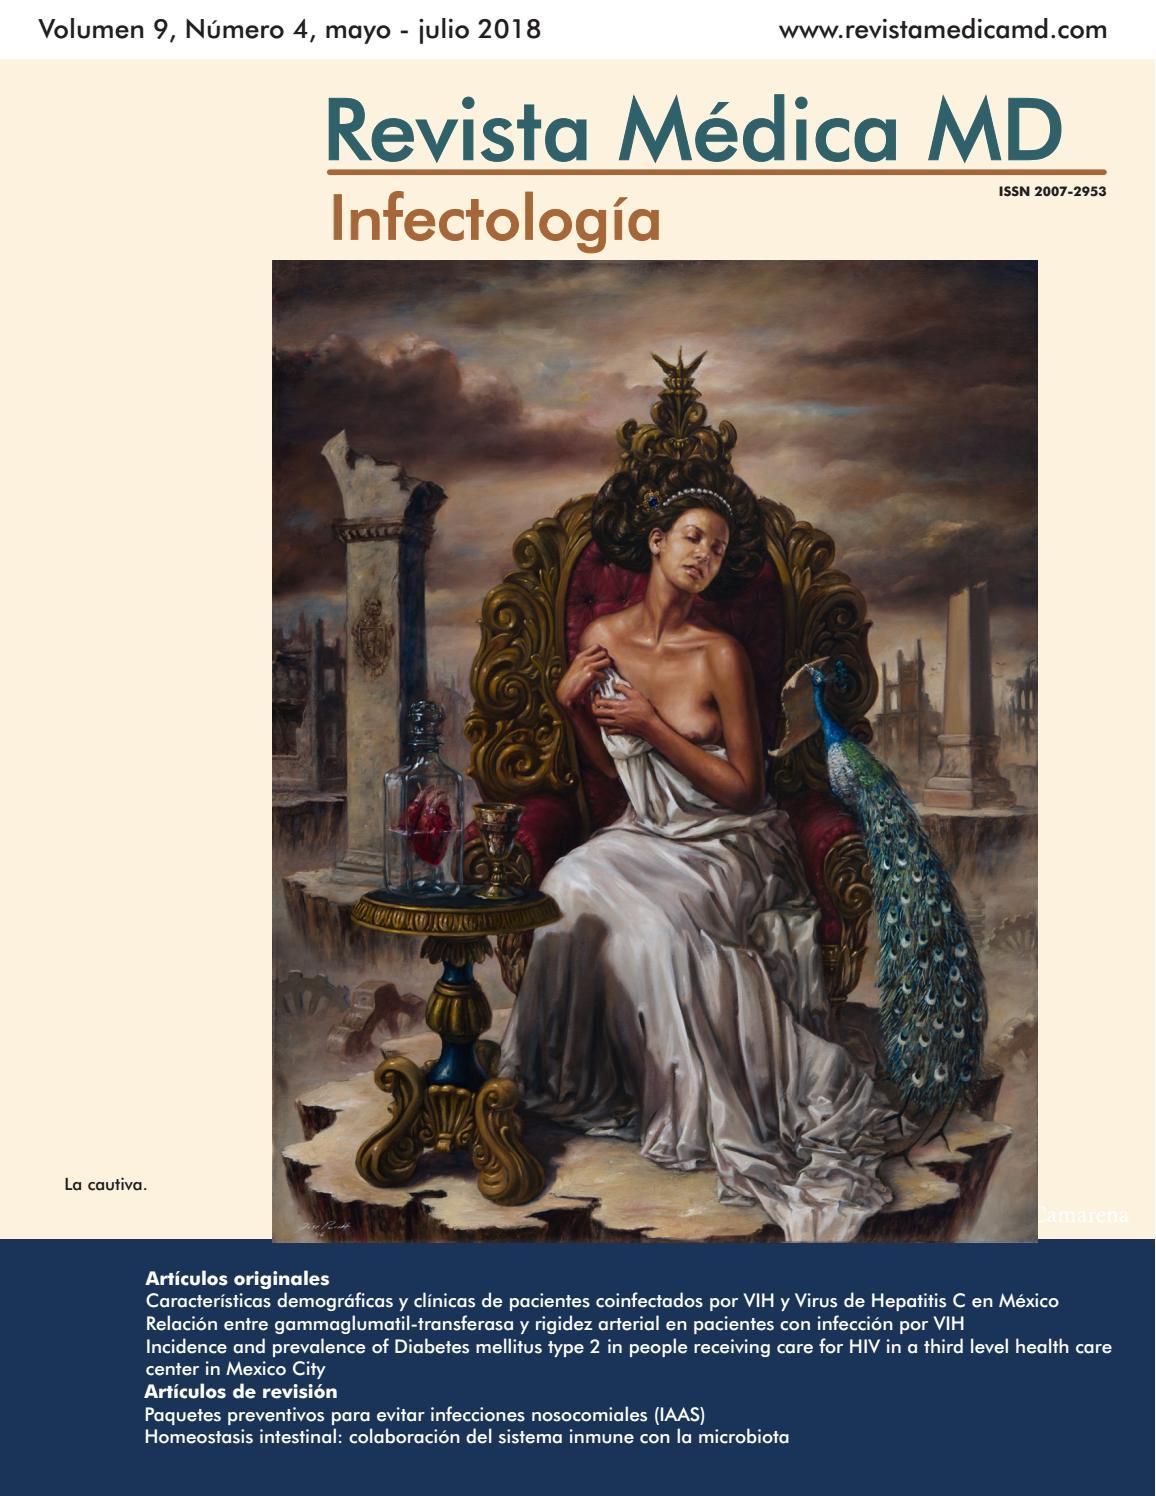 Infectología by circuloparaguayom - issuu